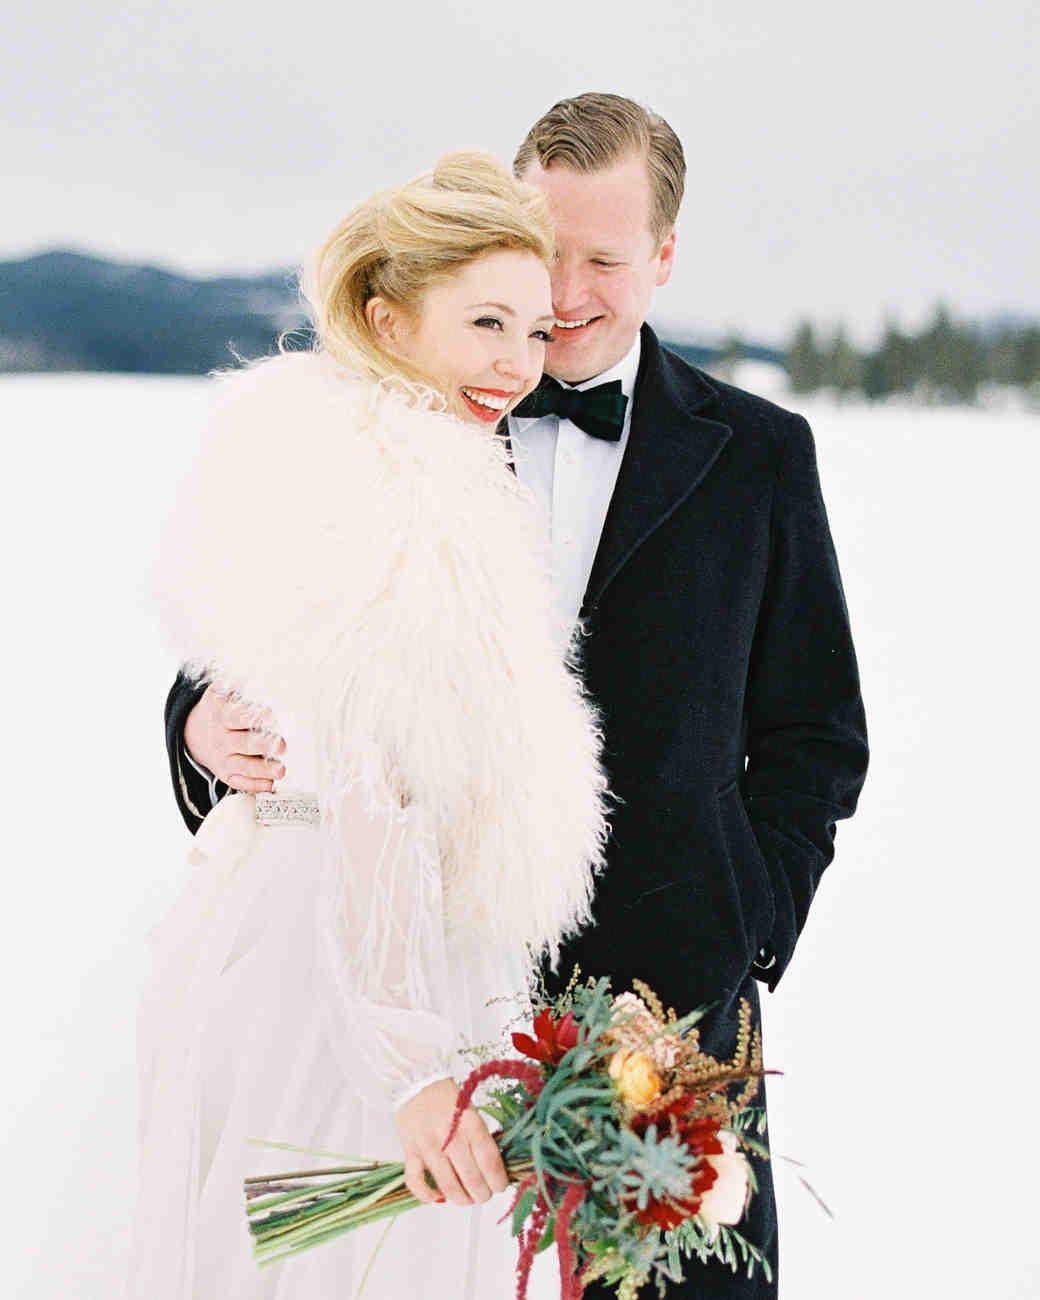 tiffany-nicholas-wedding-portrait3-060-s111339-0714.jpg